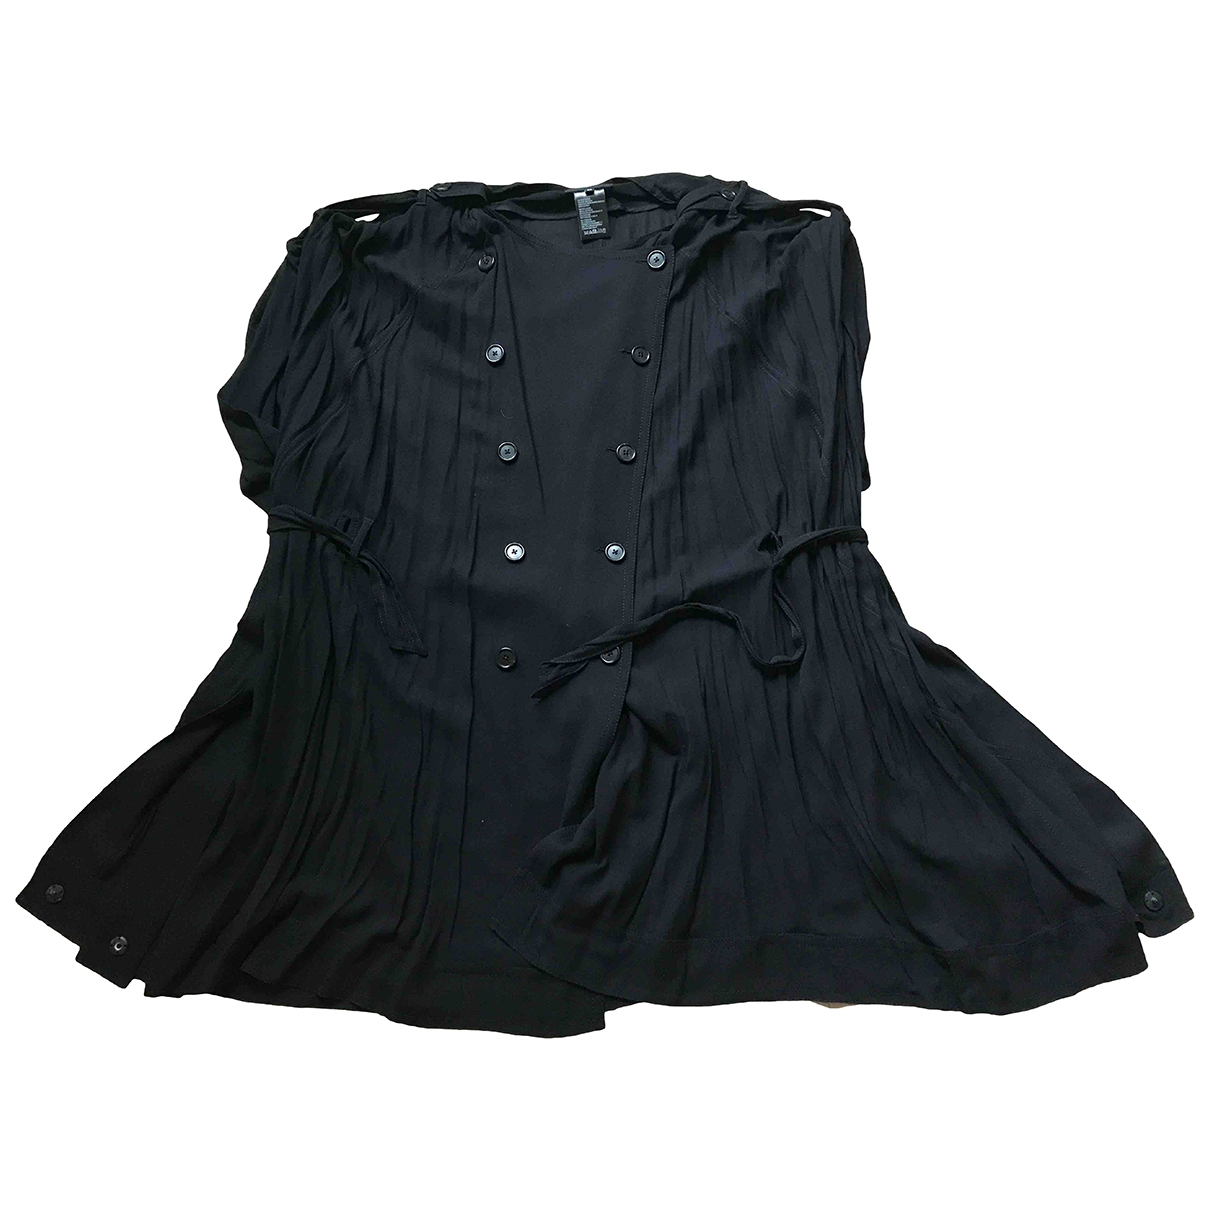 Ann Demeulemeester \N Black dress for Women 36 IT